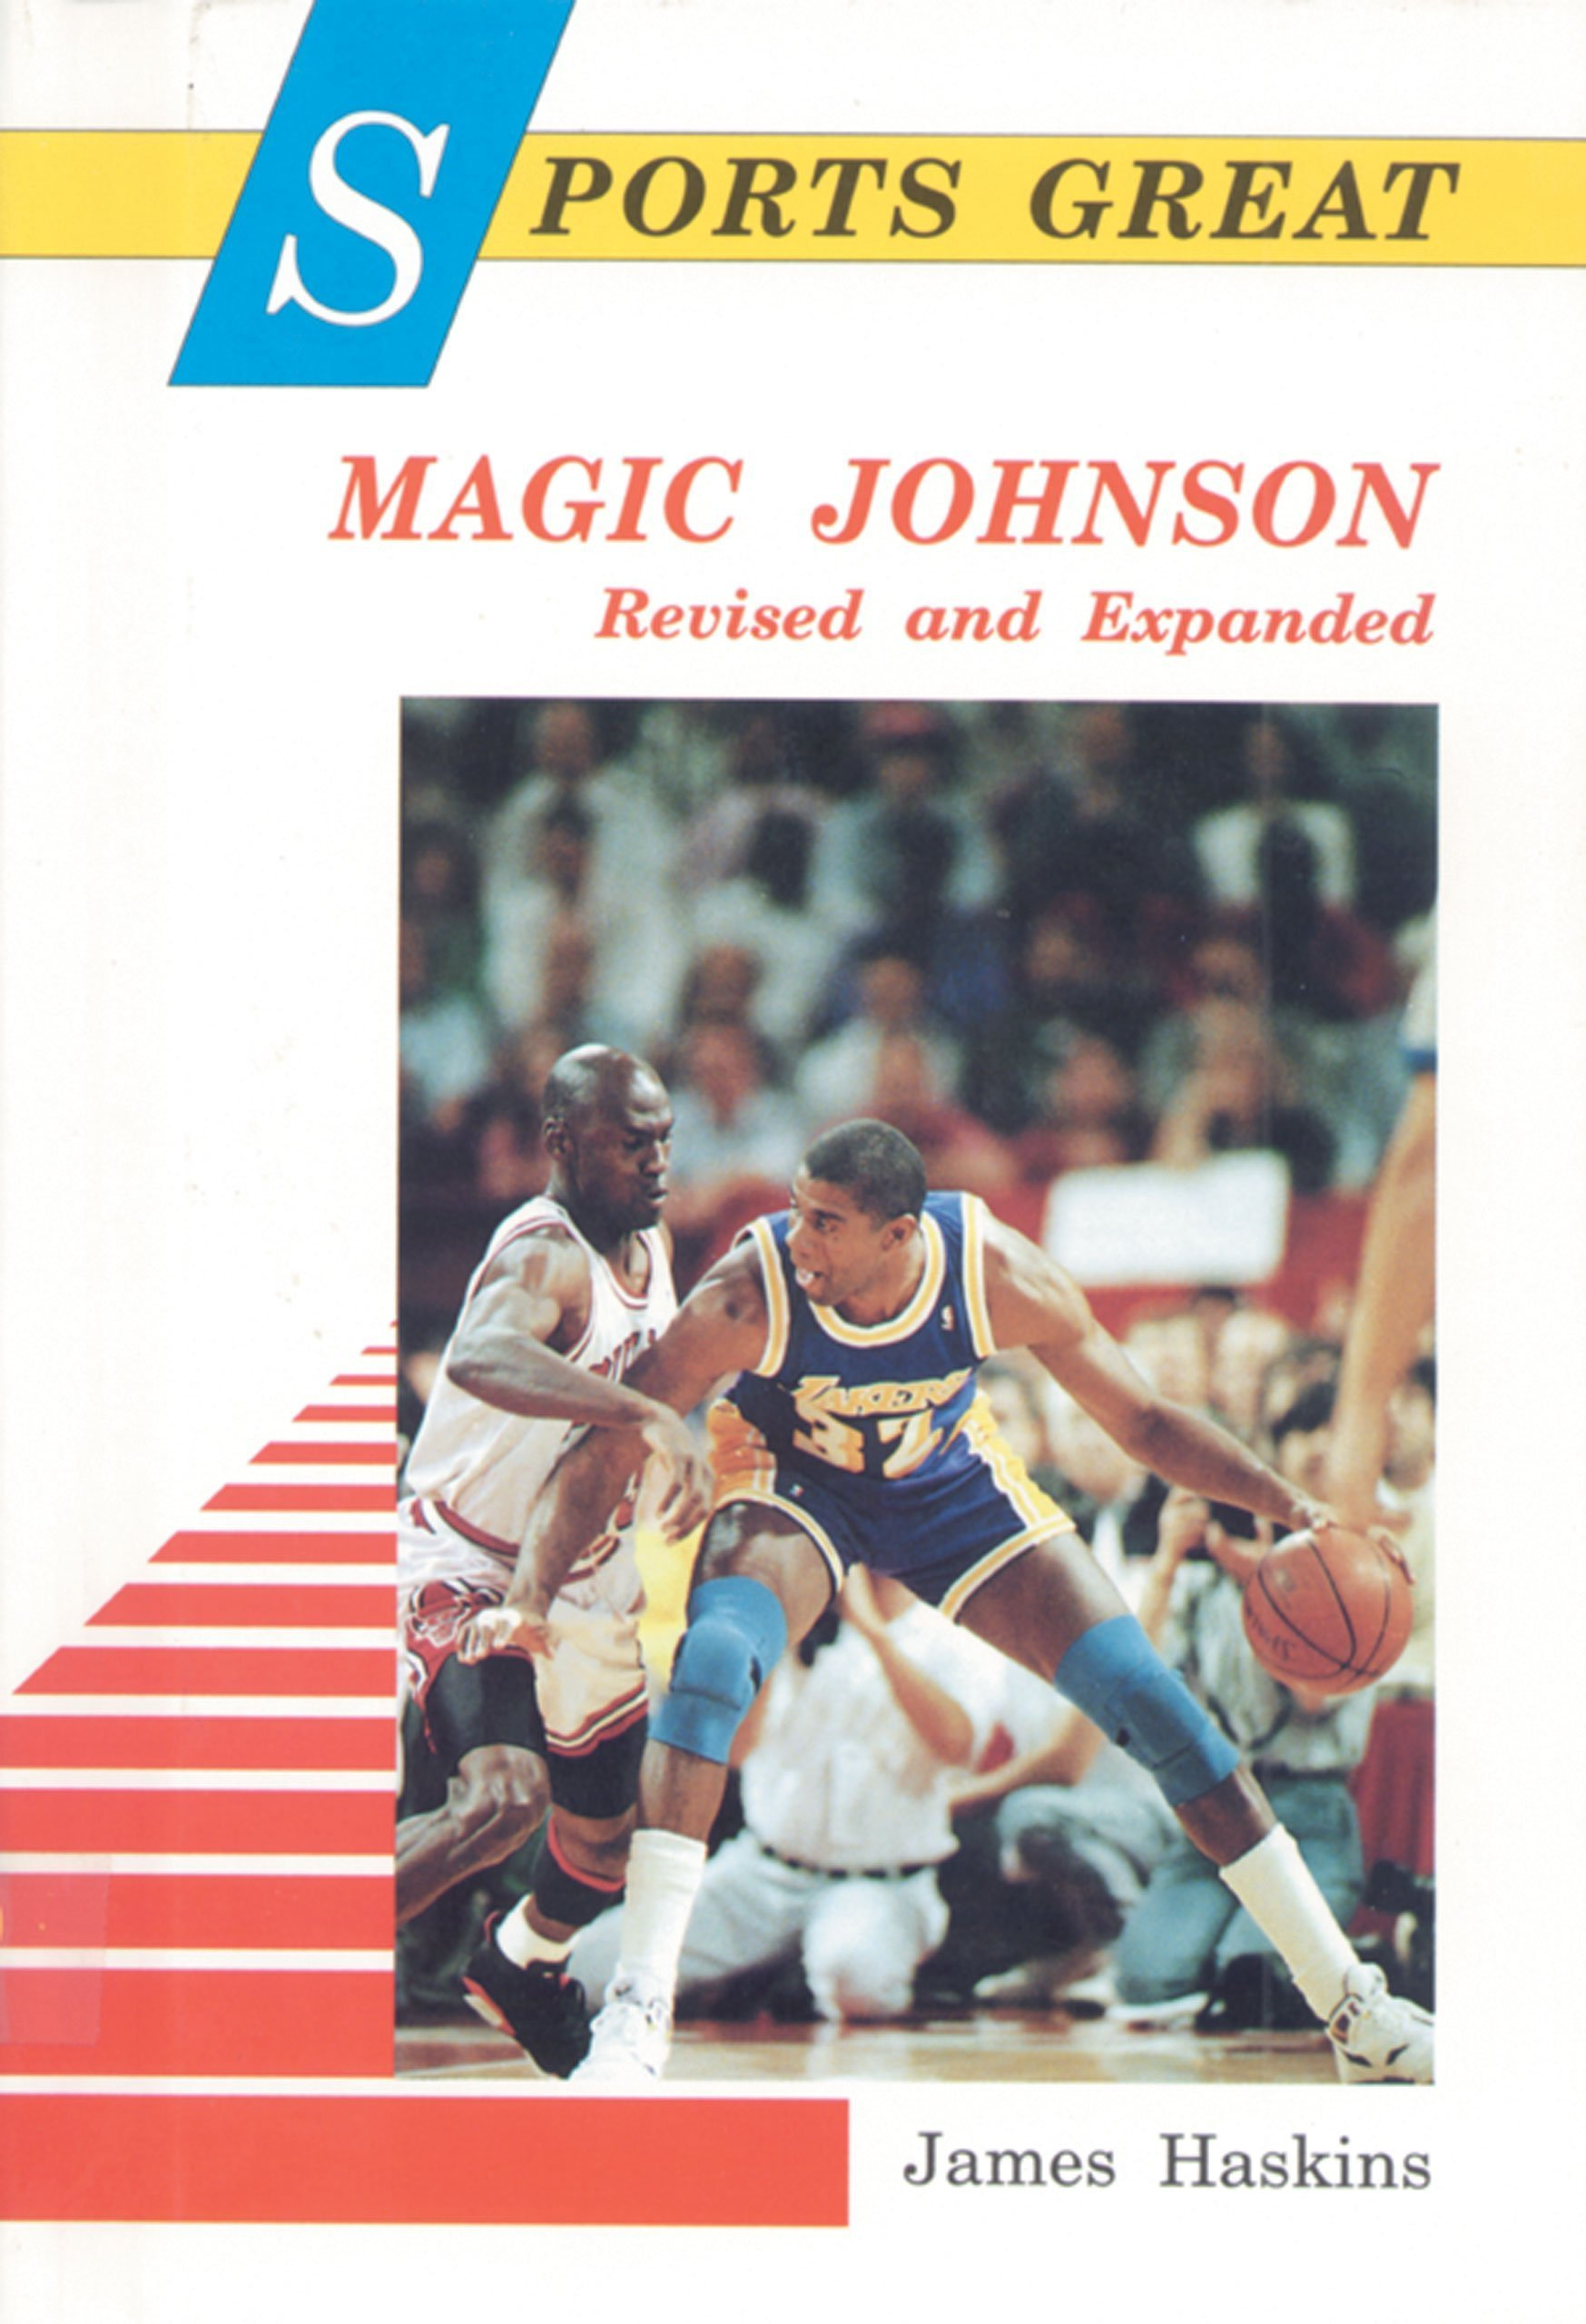 sports-great-magic-johnson-sports-great-books